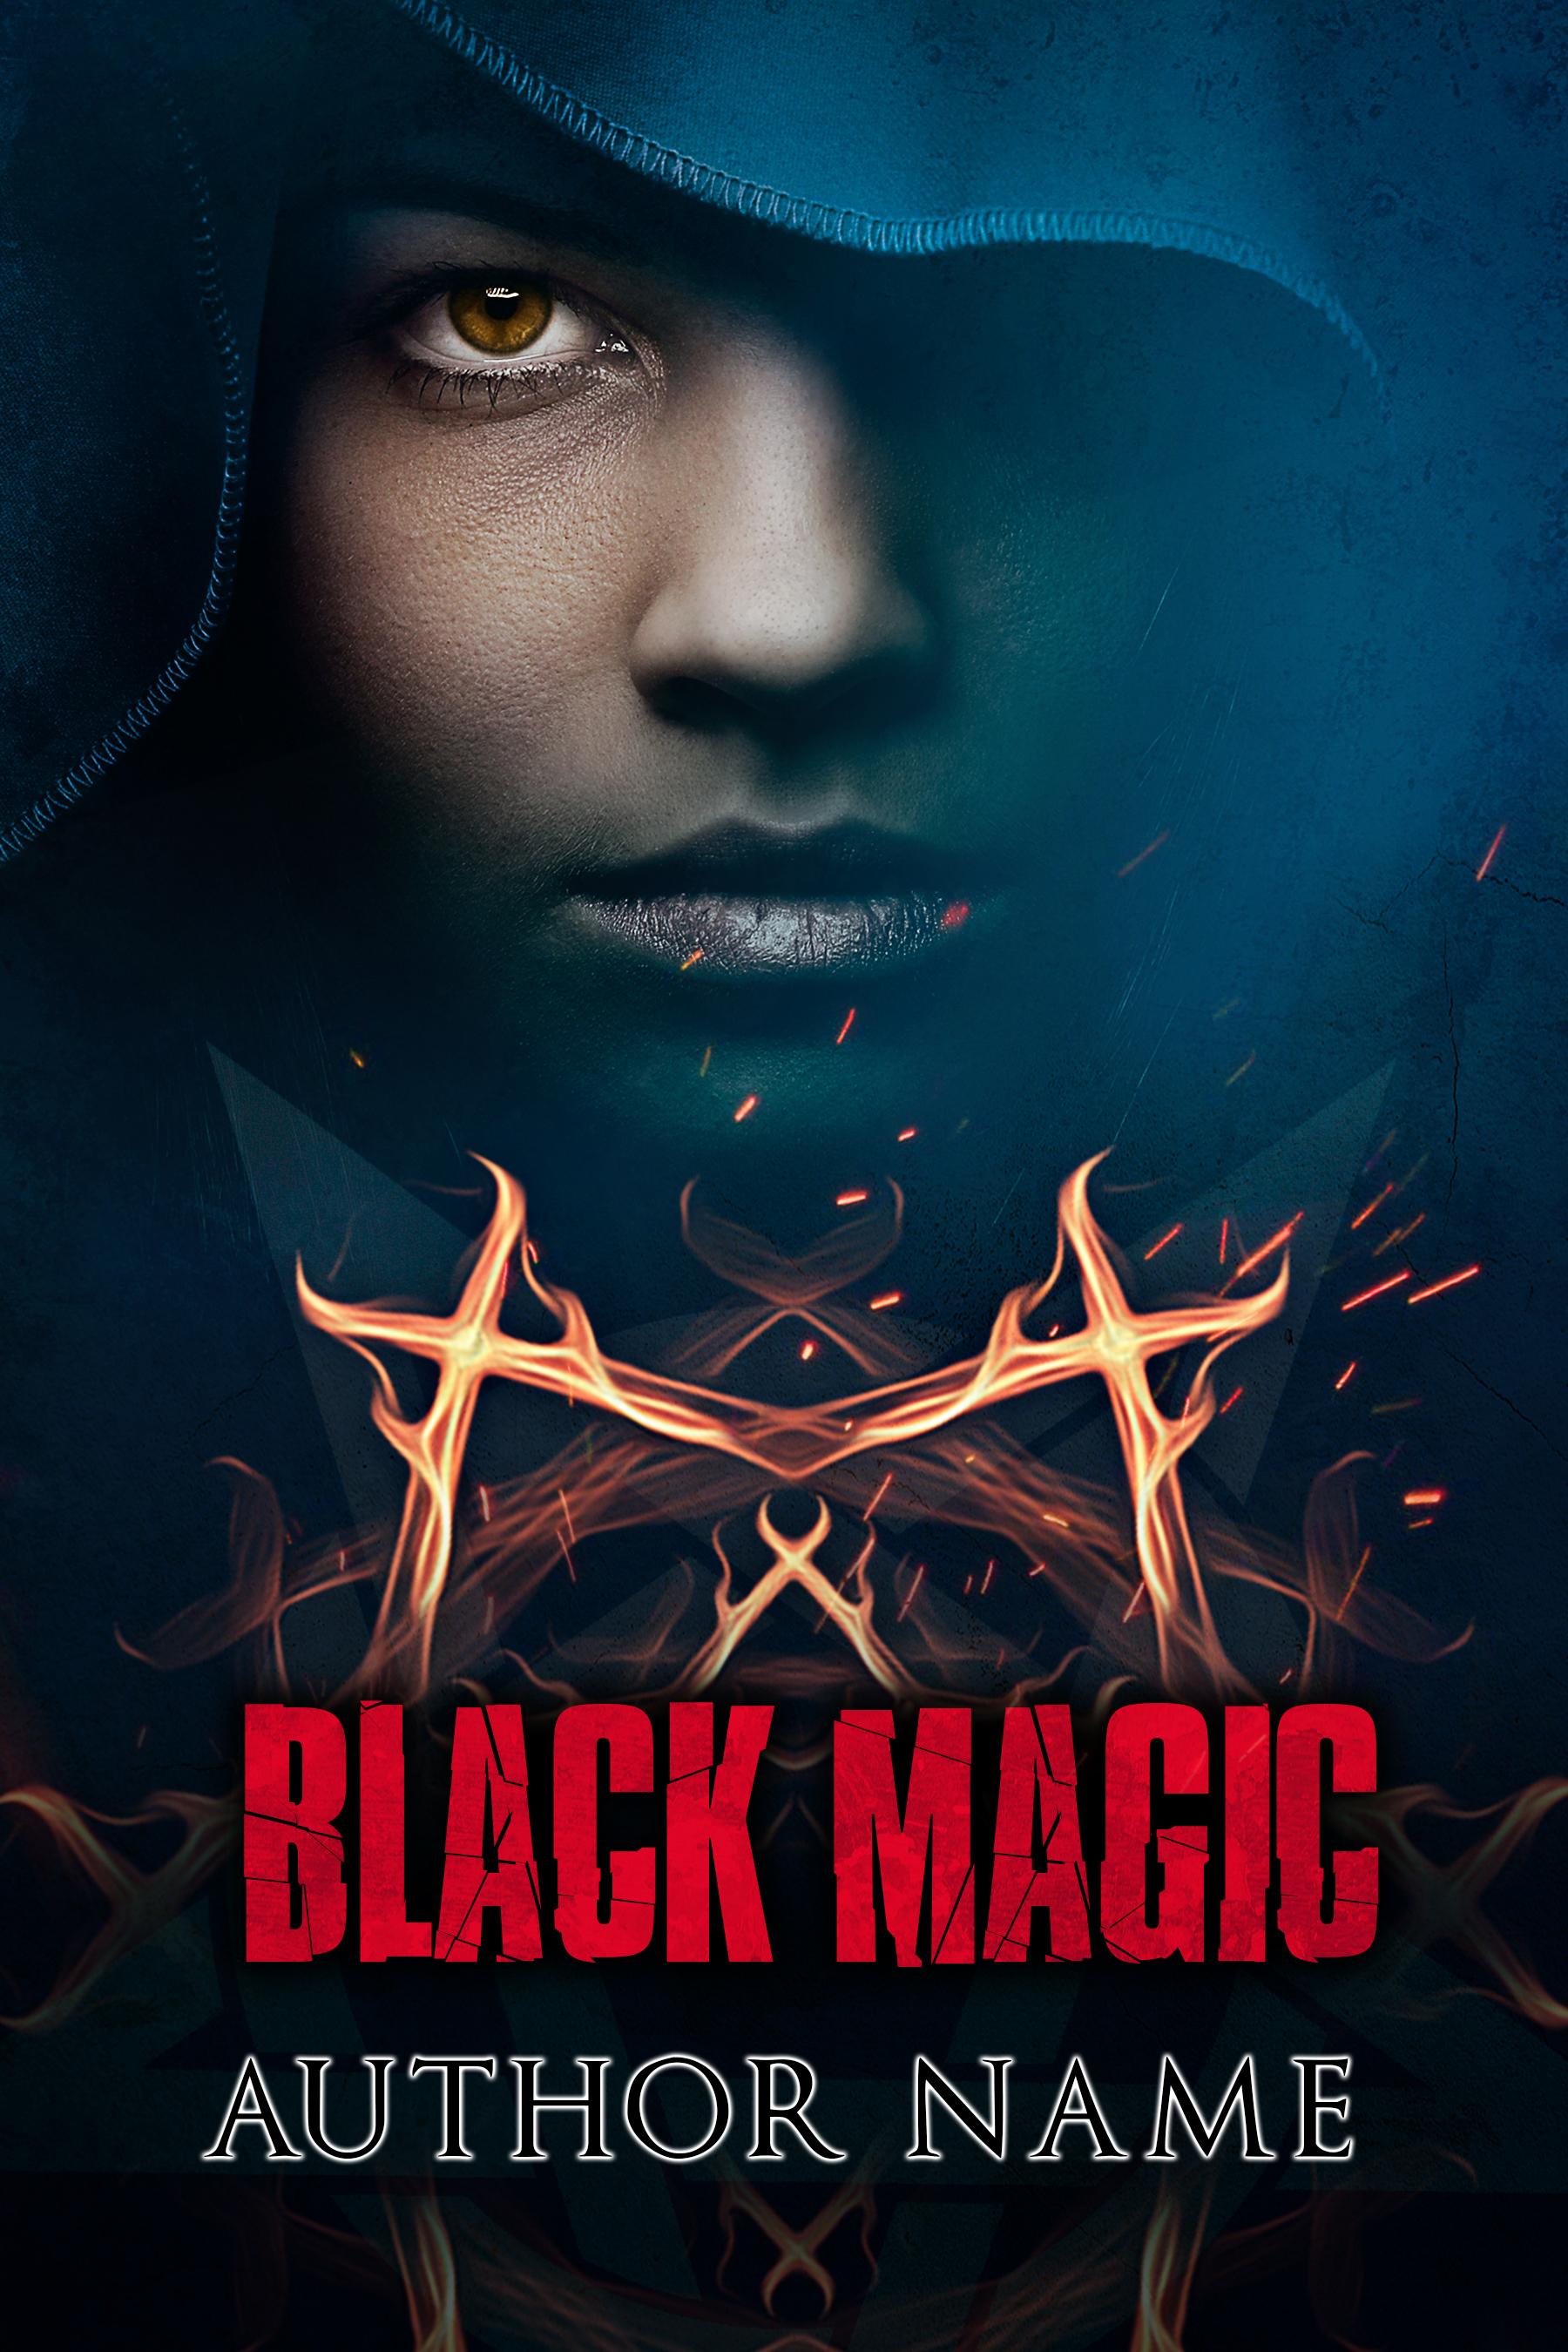 Book Cover Design Black : Black magic the book cover designer